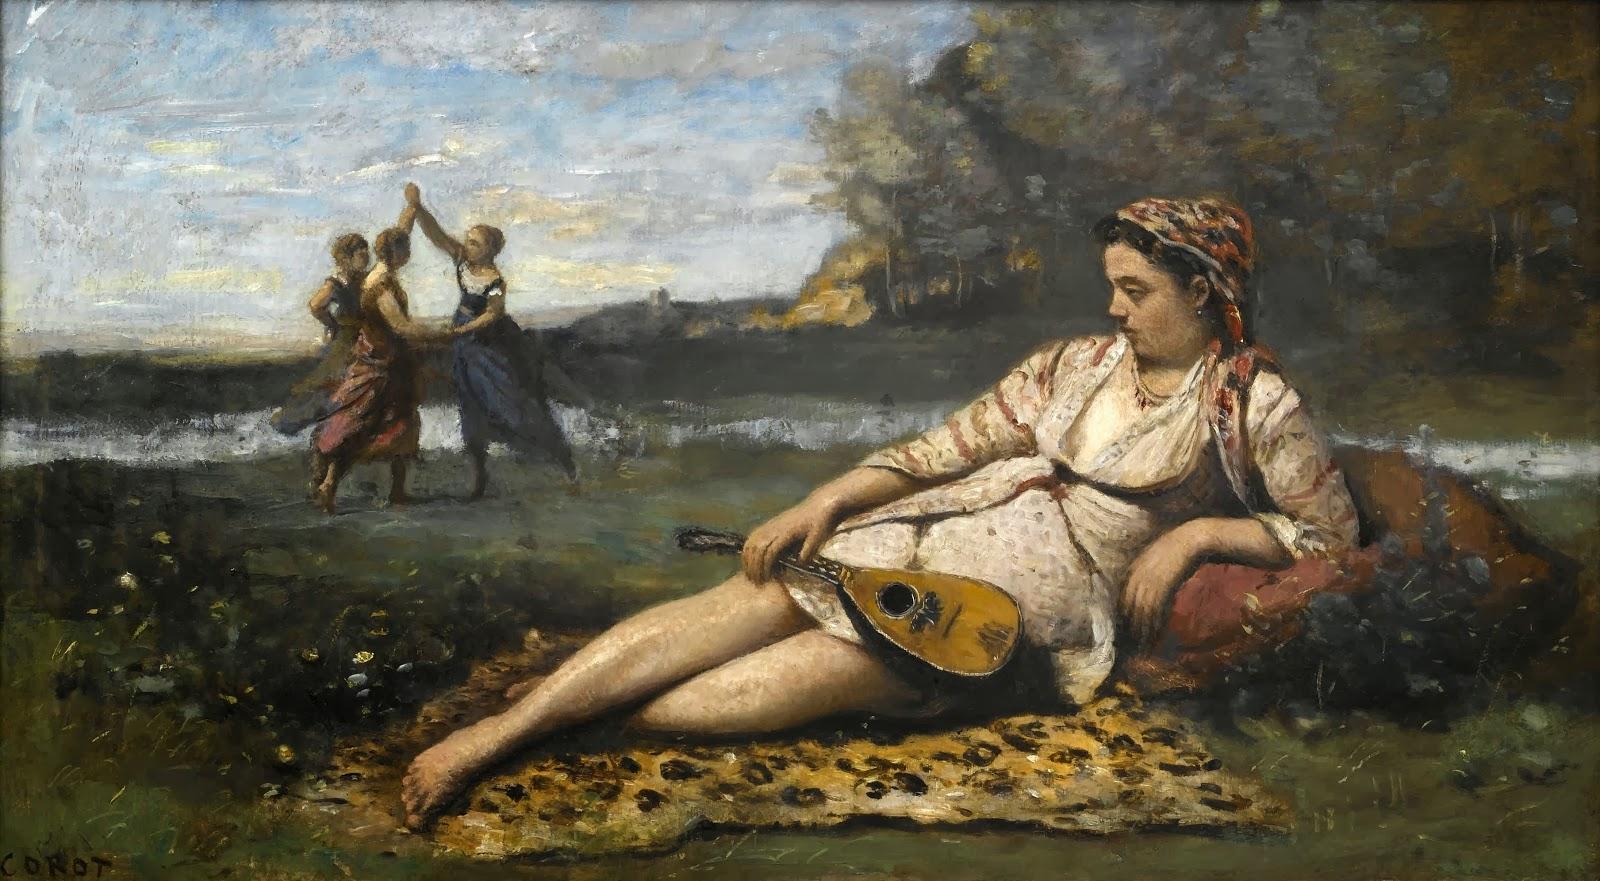 Jeunes filles de Sparte, ca. 1868-1870